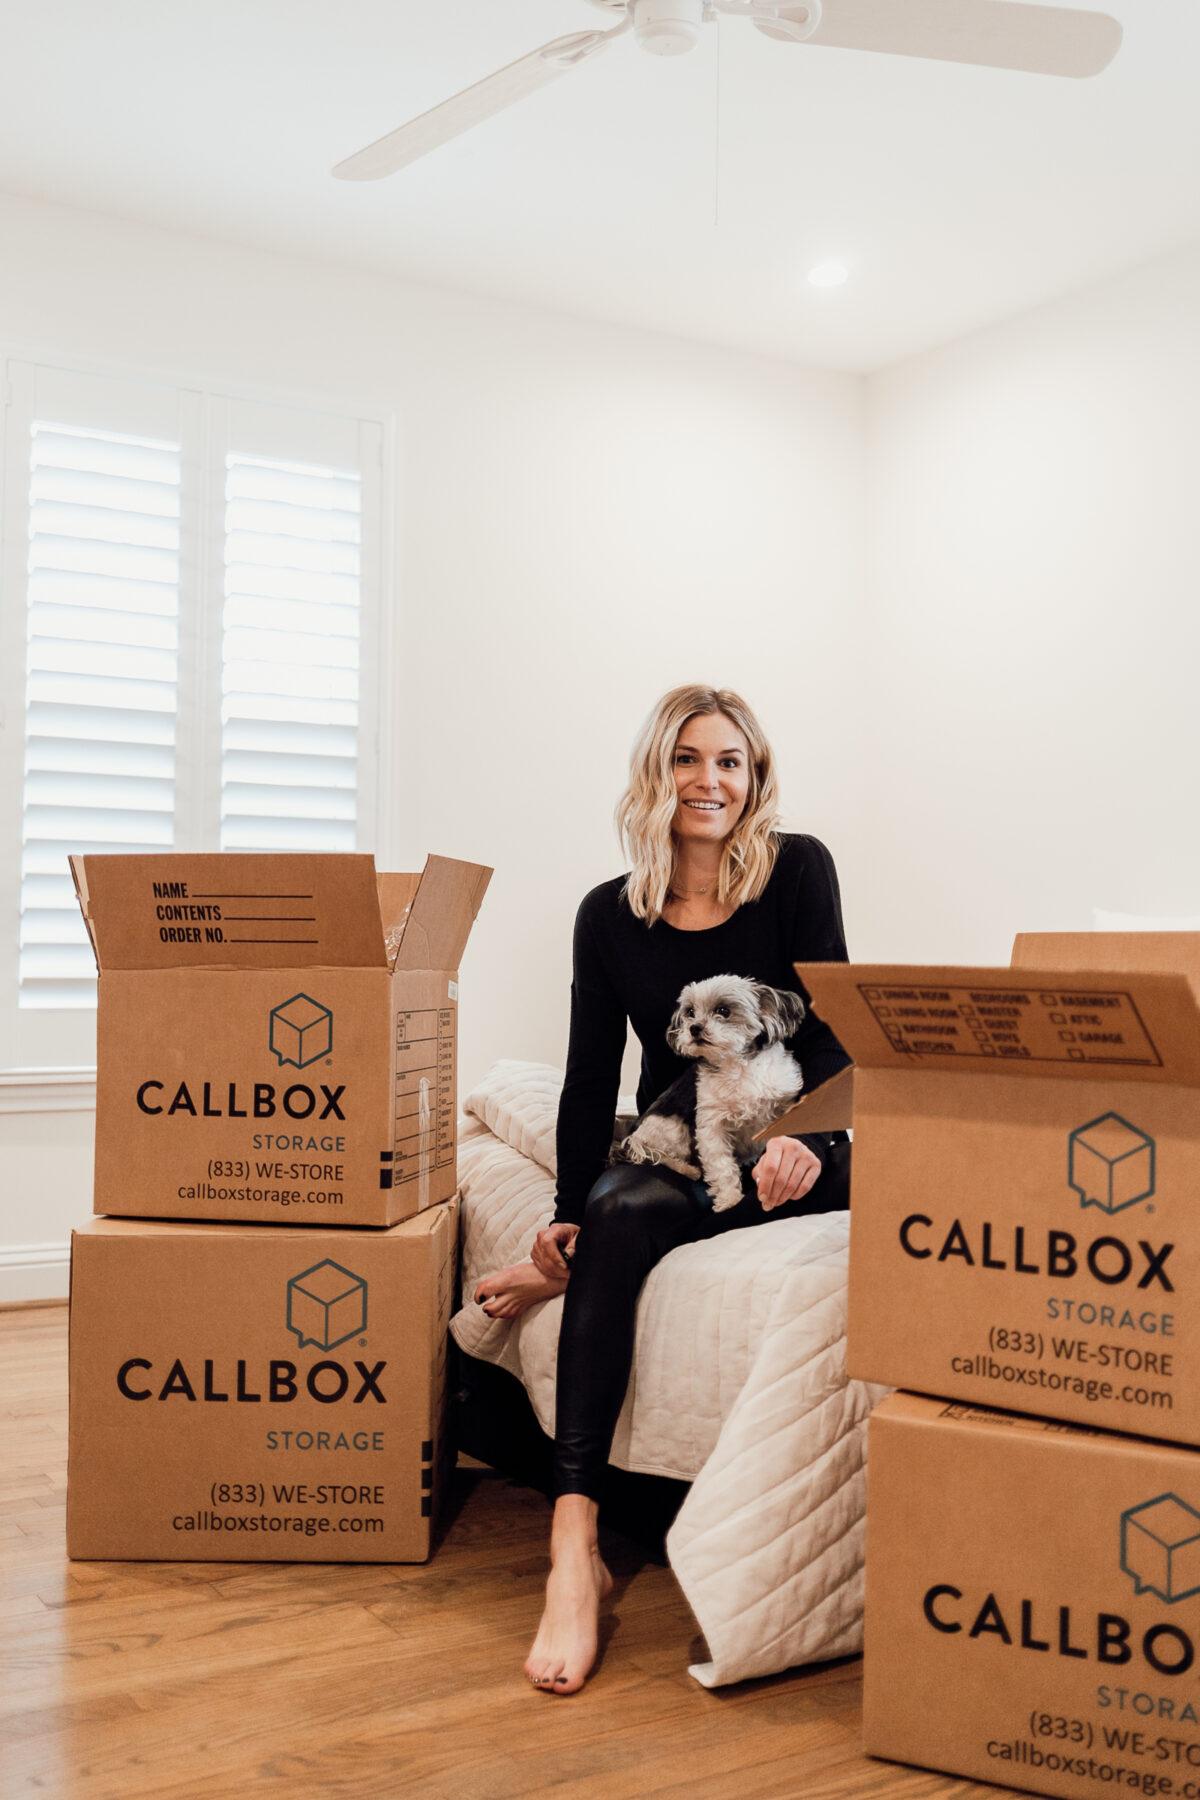 callbox movers